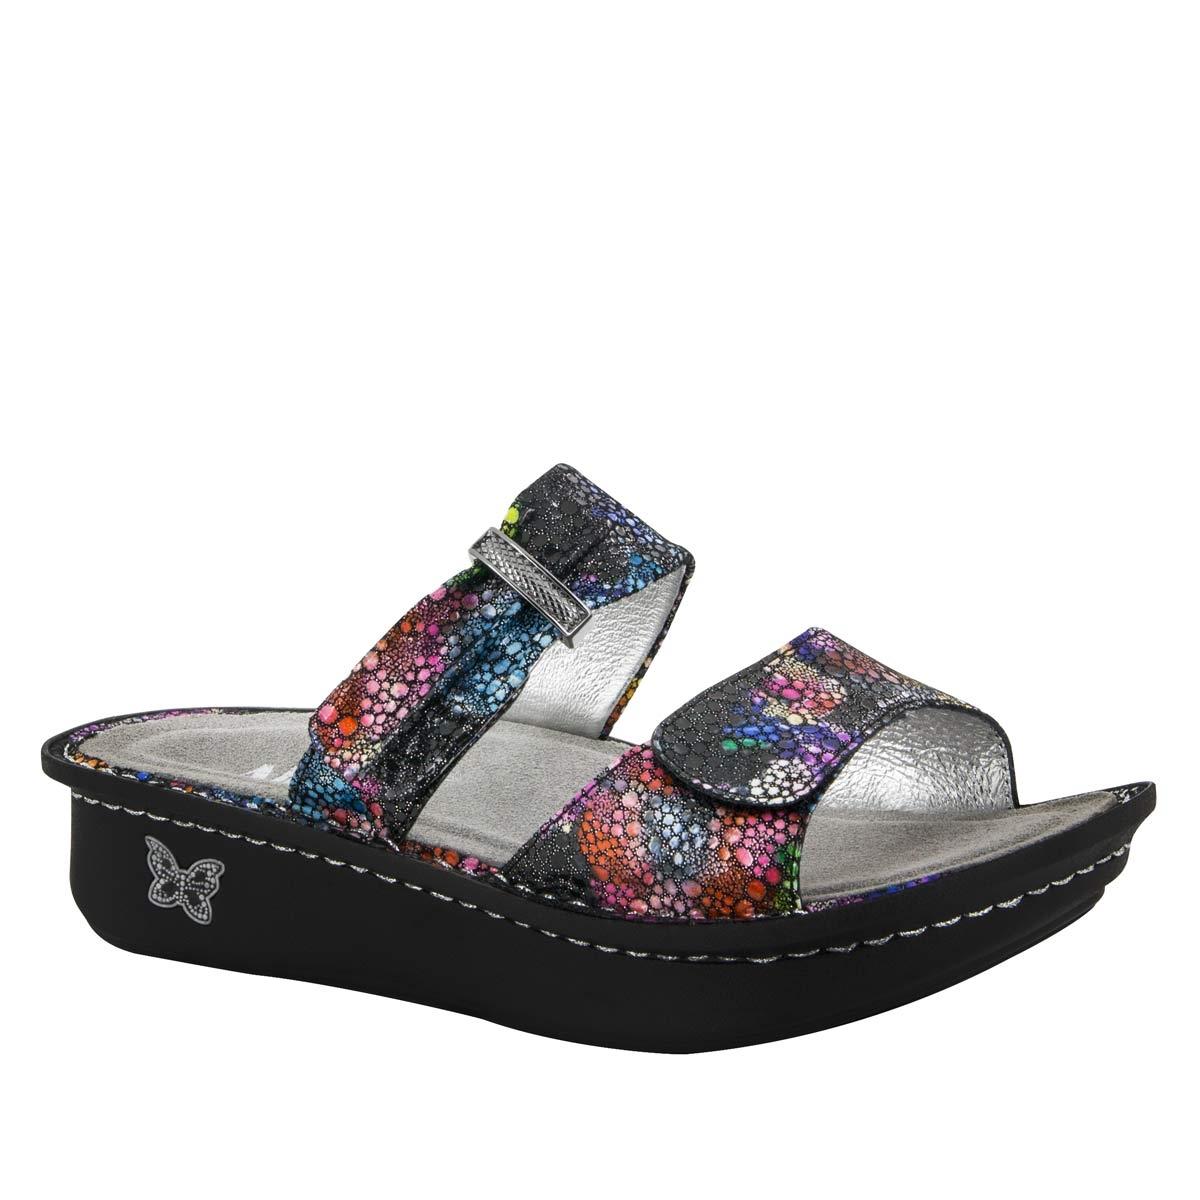 Alegria Shoes Karmen Bubblish